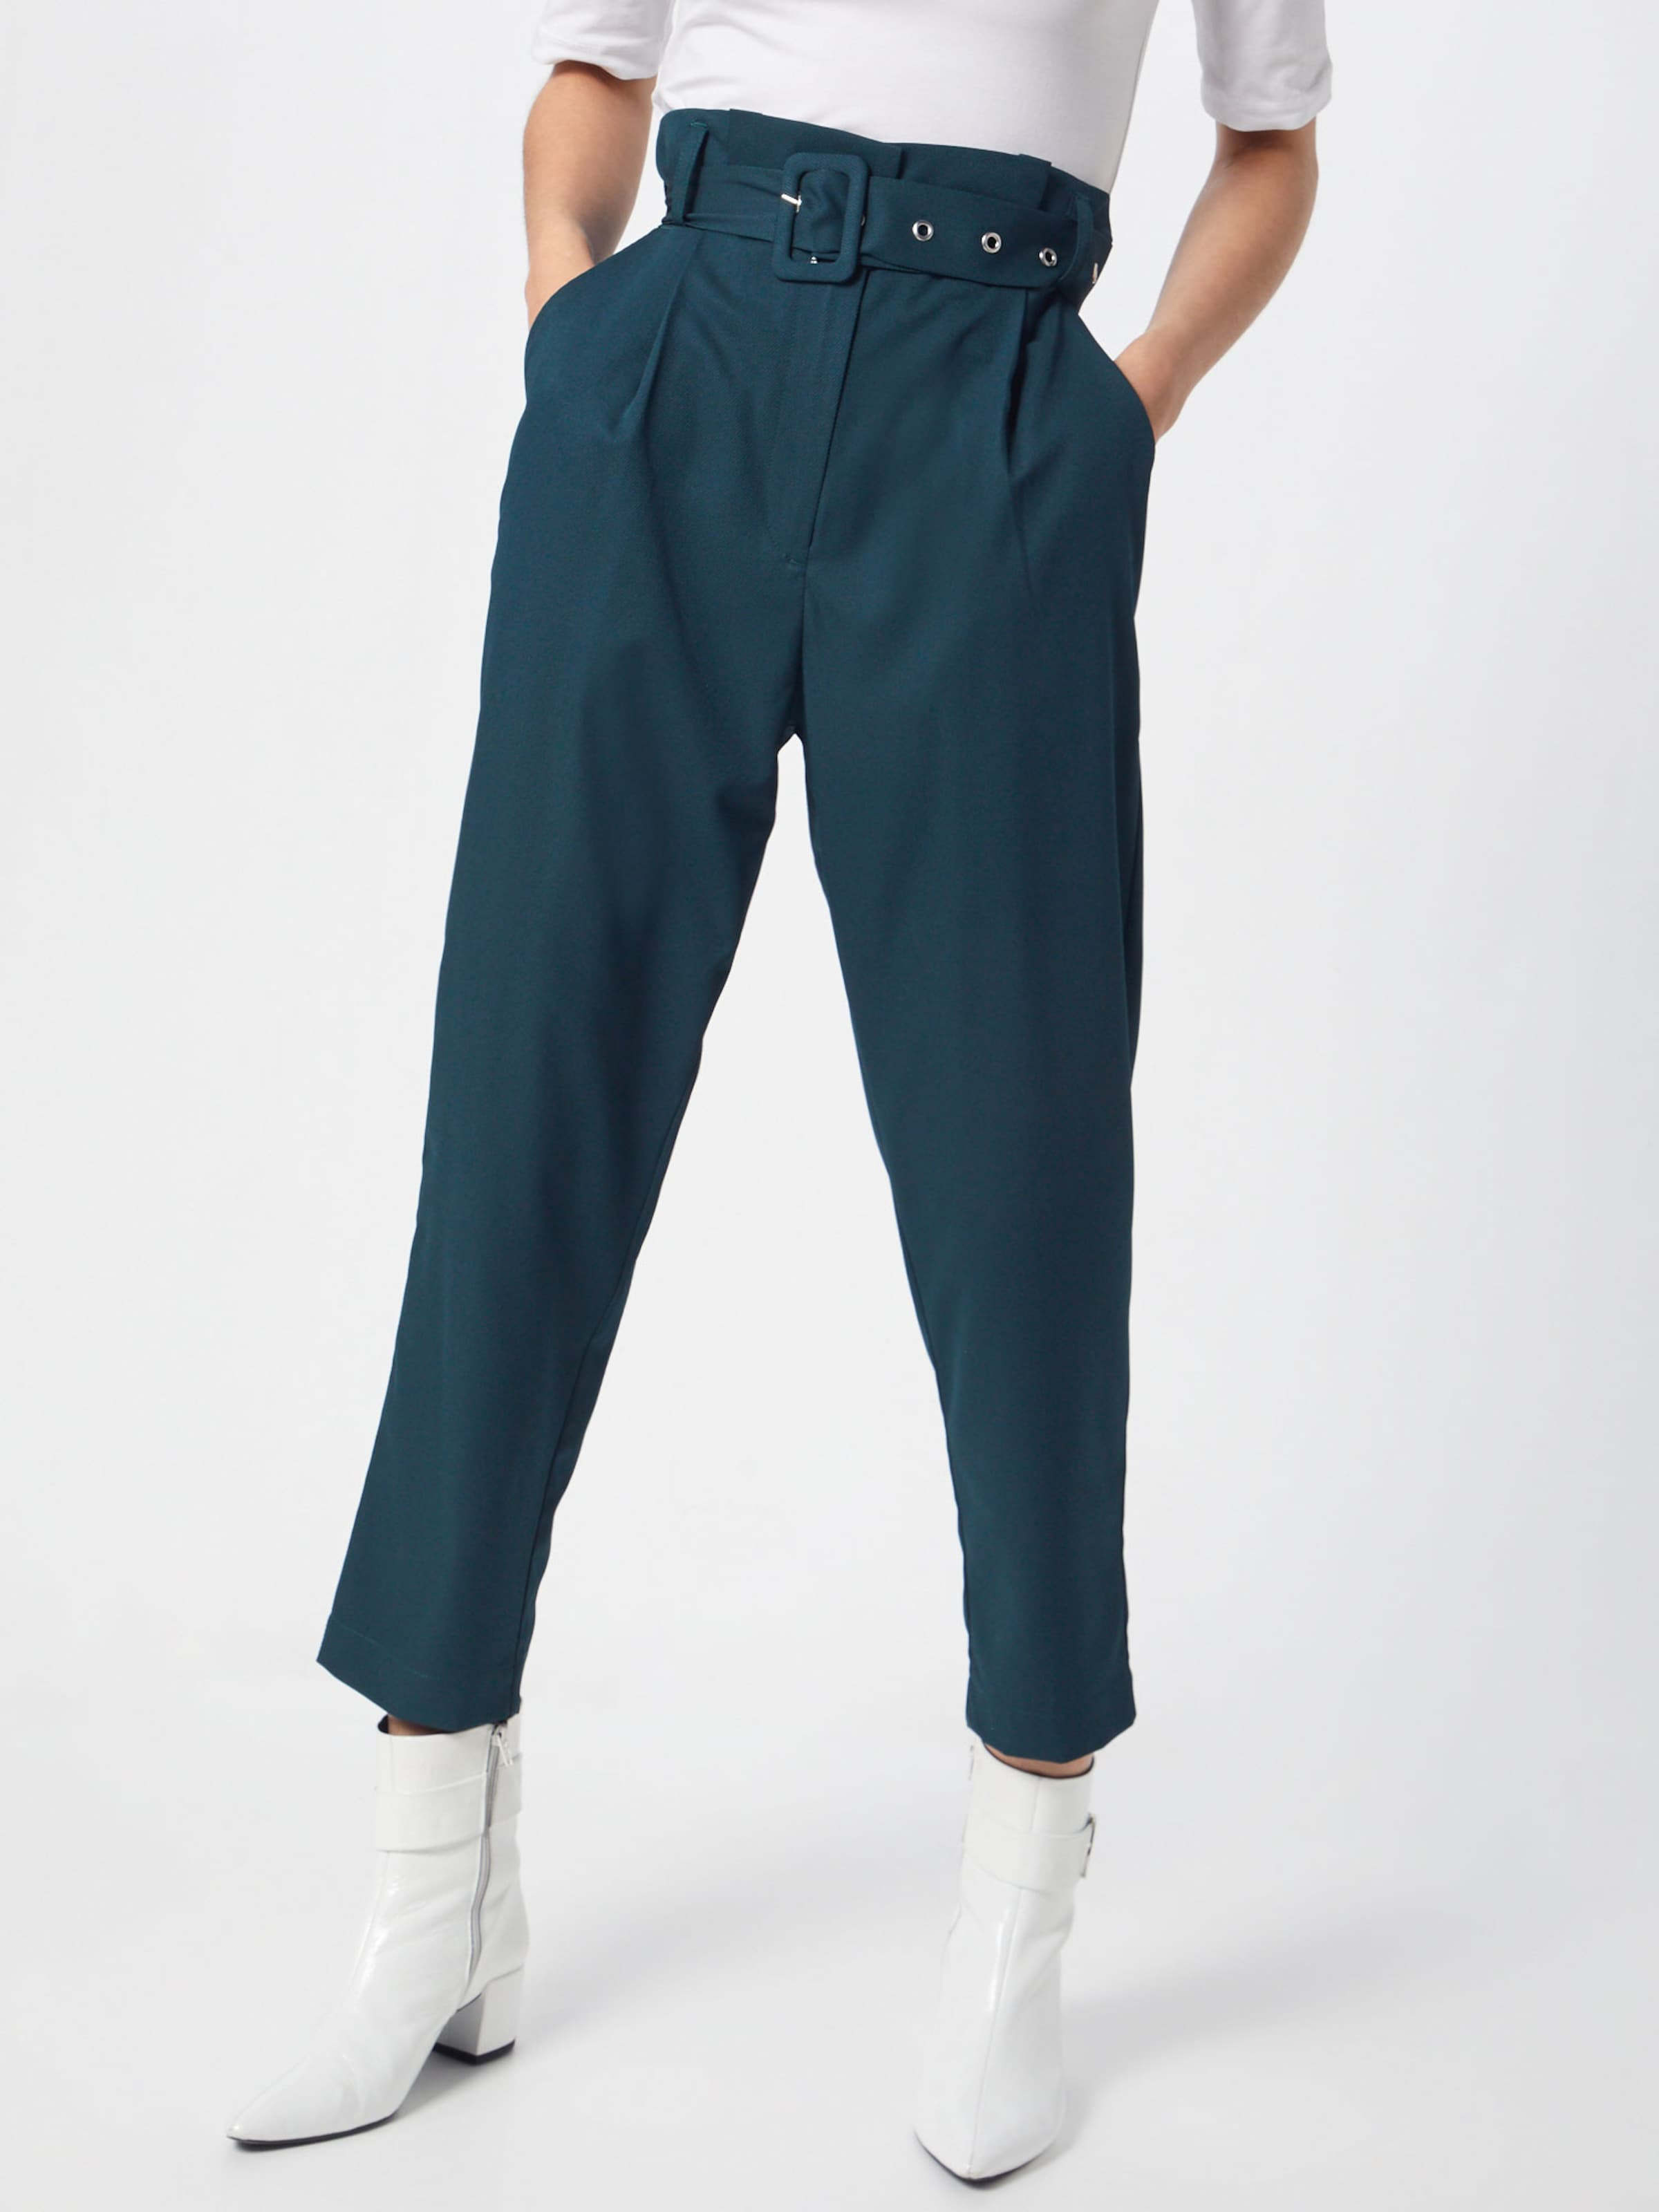 'charlie' About À En Pince Foncé Pantalon Vert You 6fvYby7g